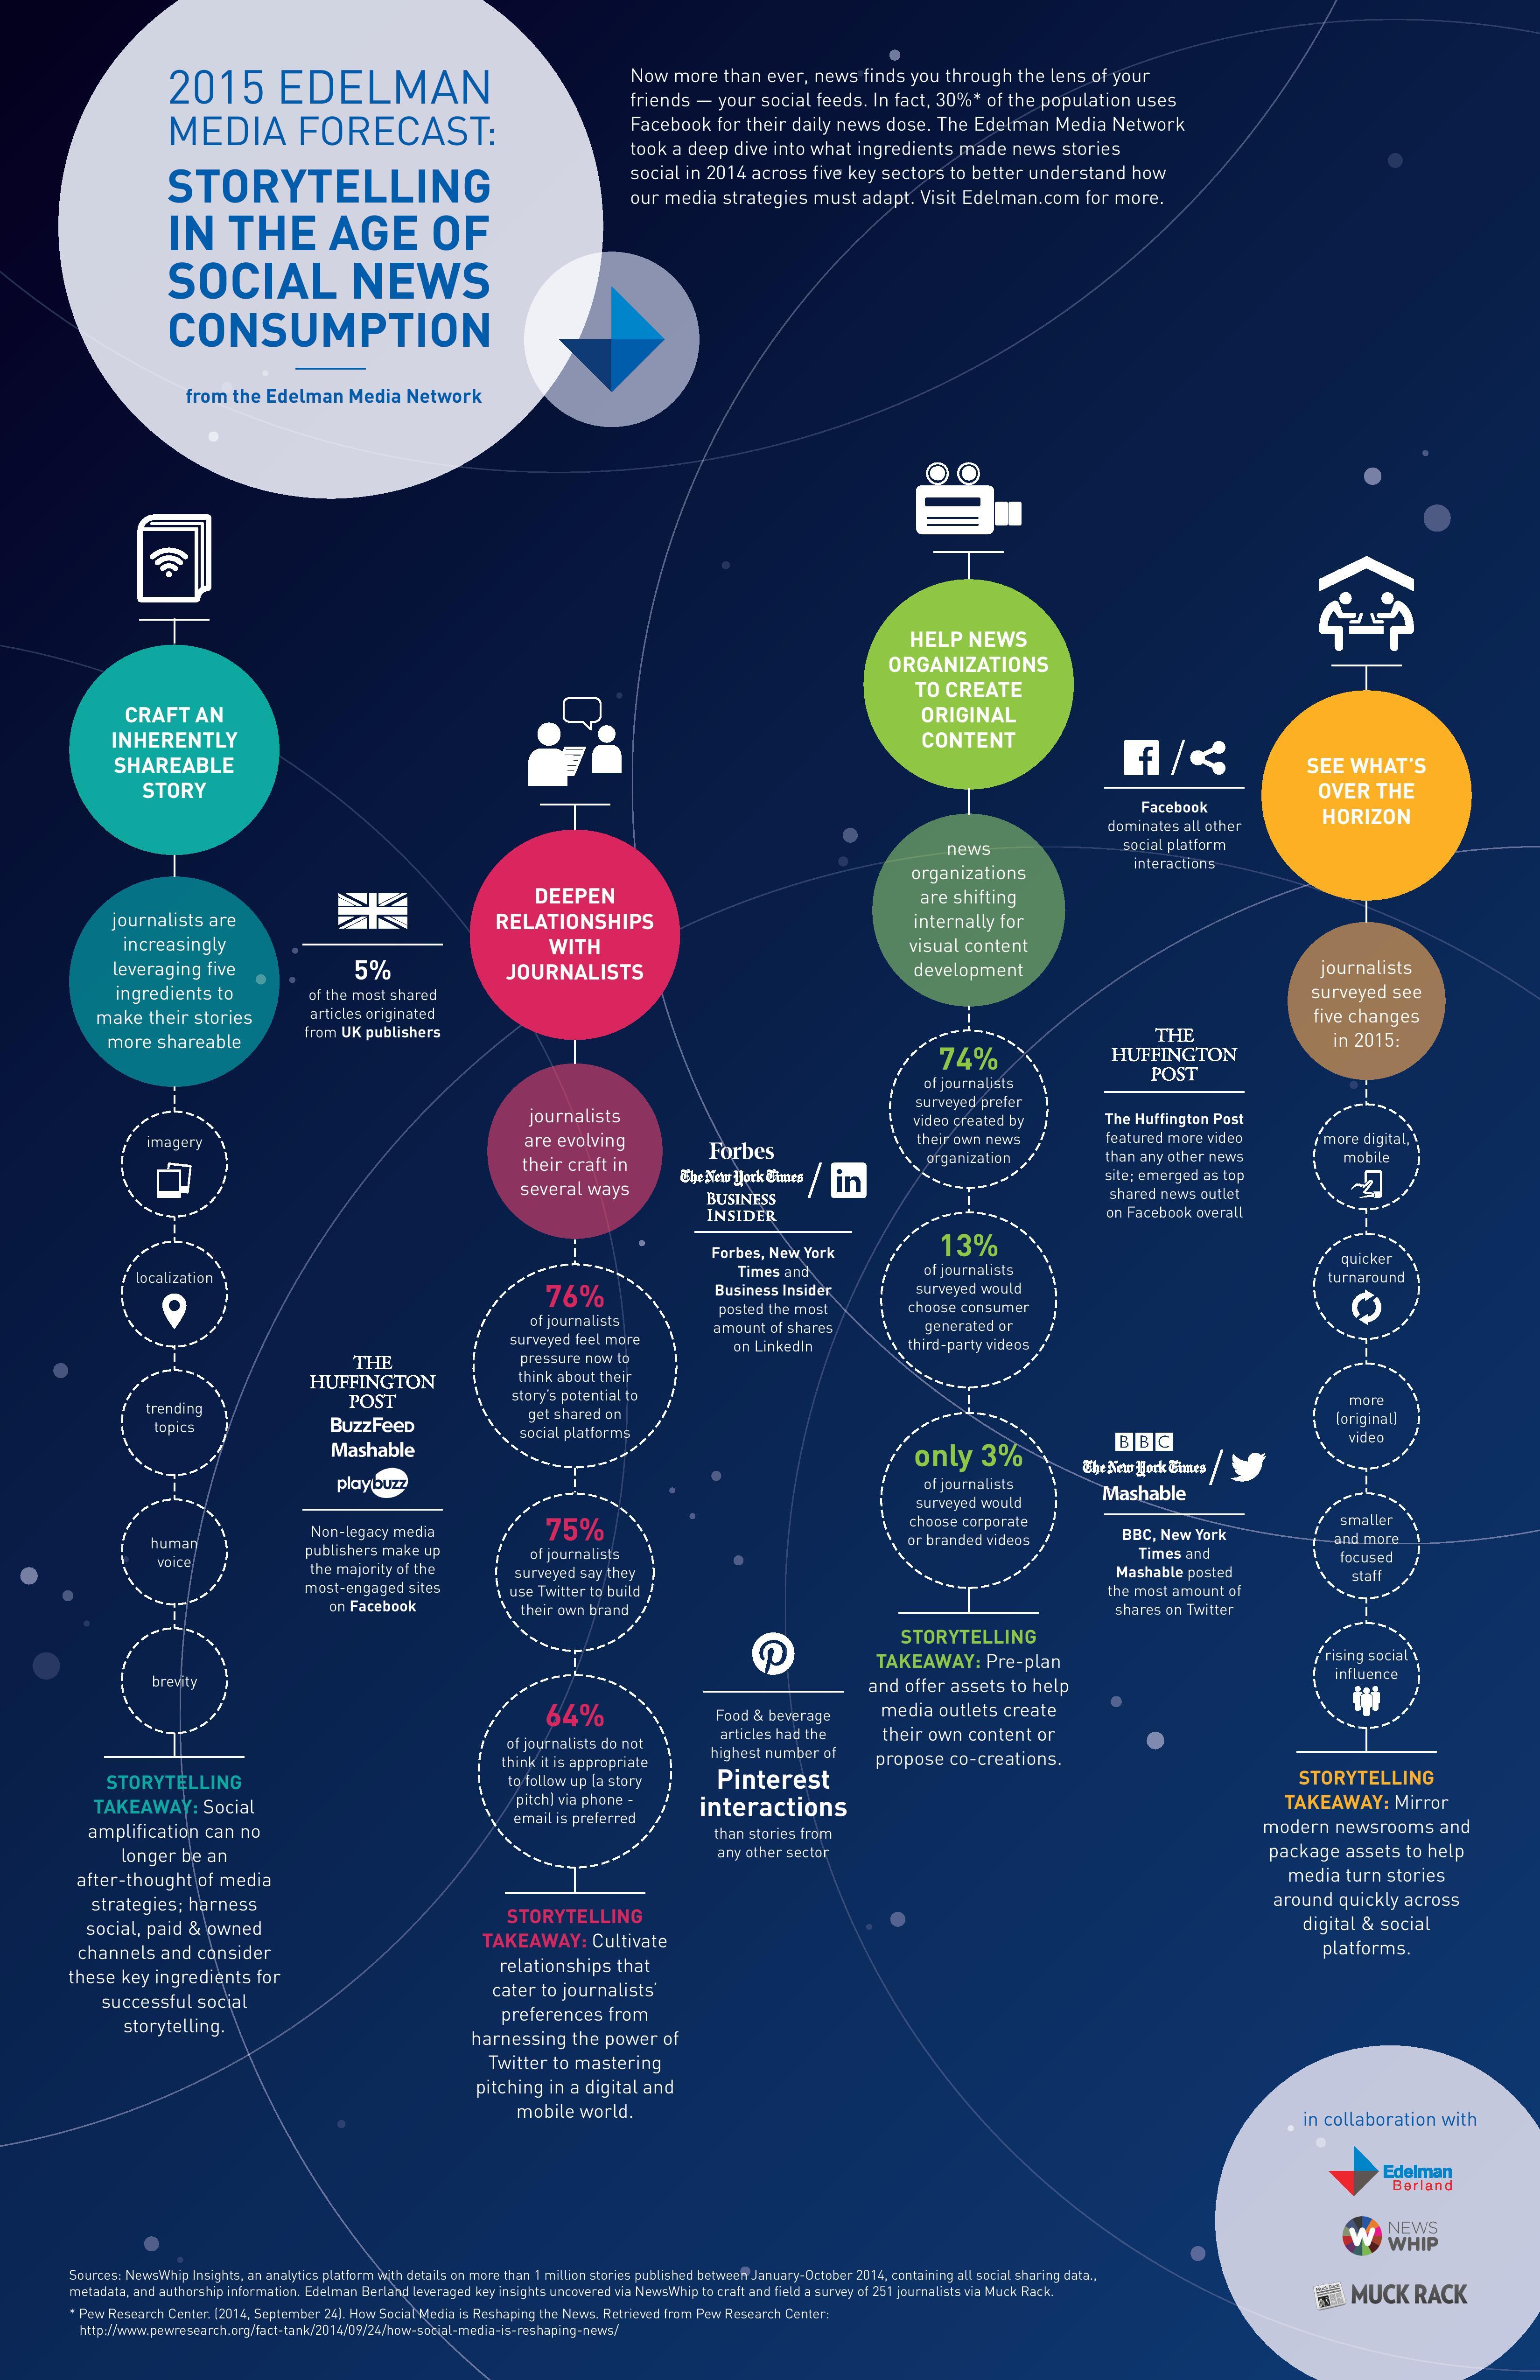 Storytelling-Media-Trends-Infographic-2014